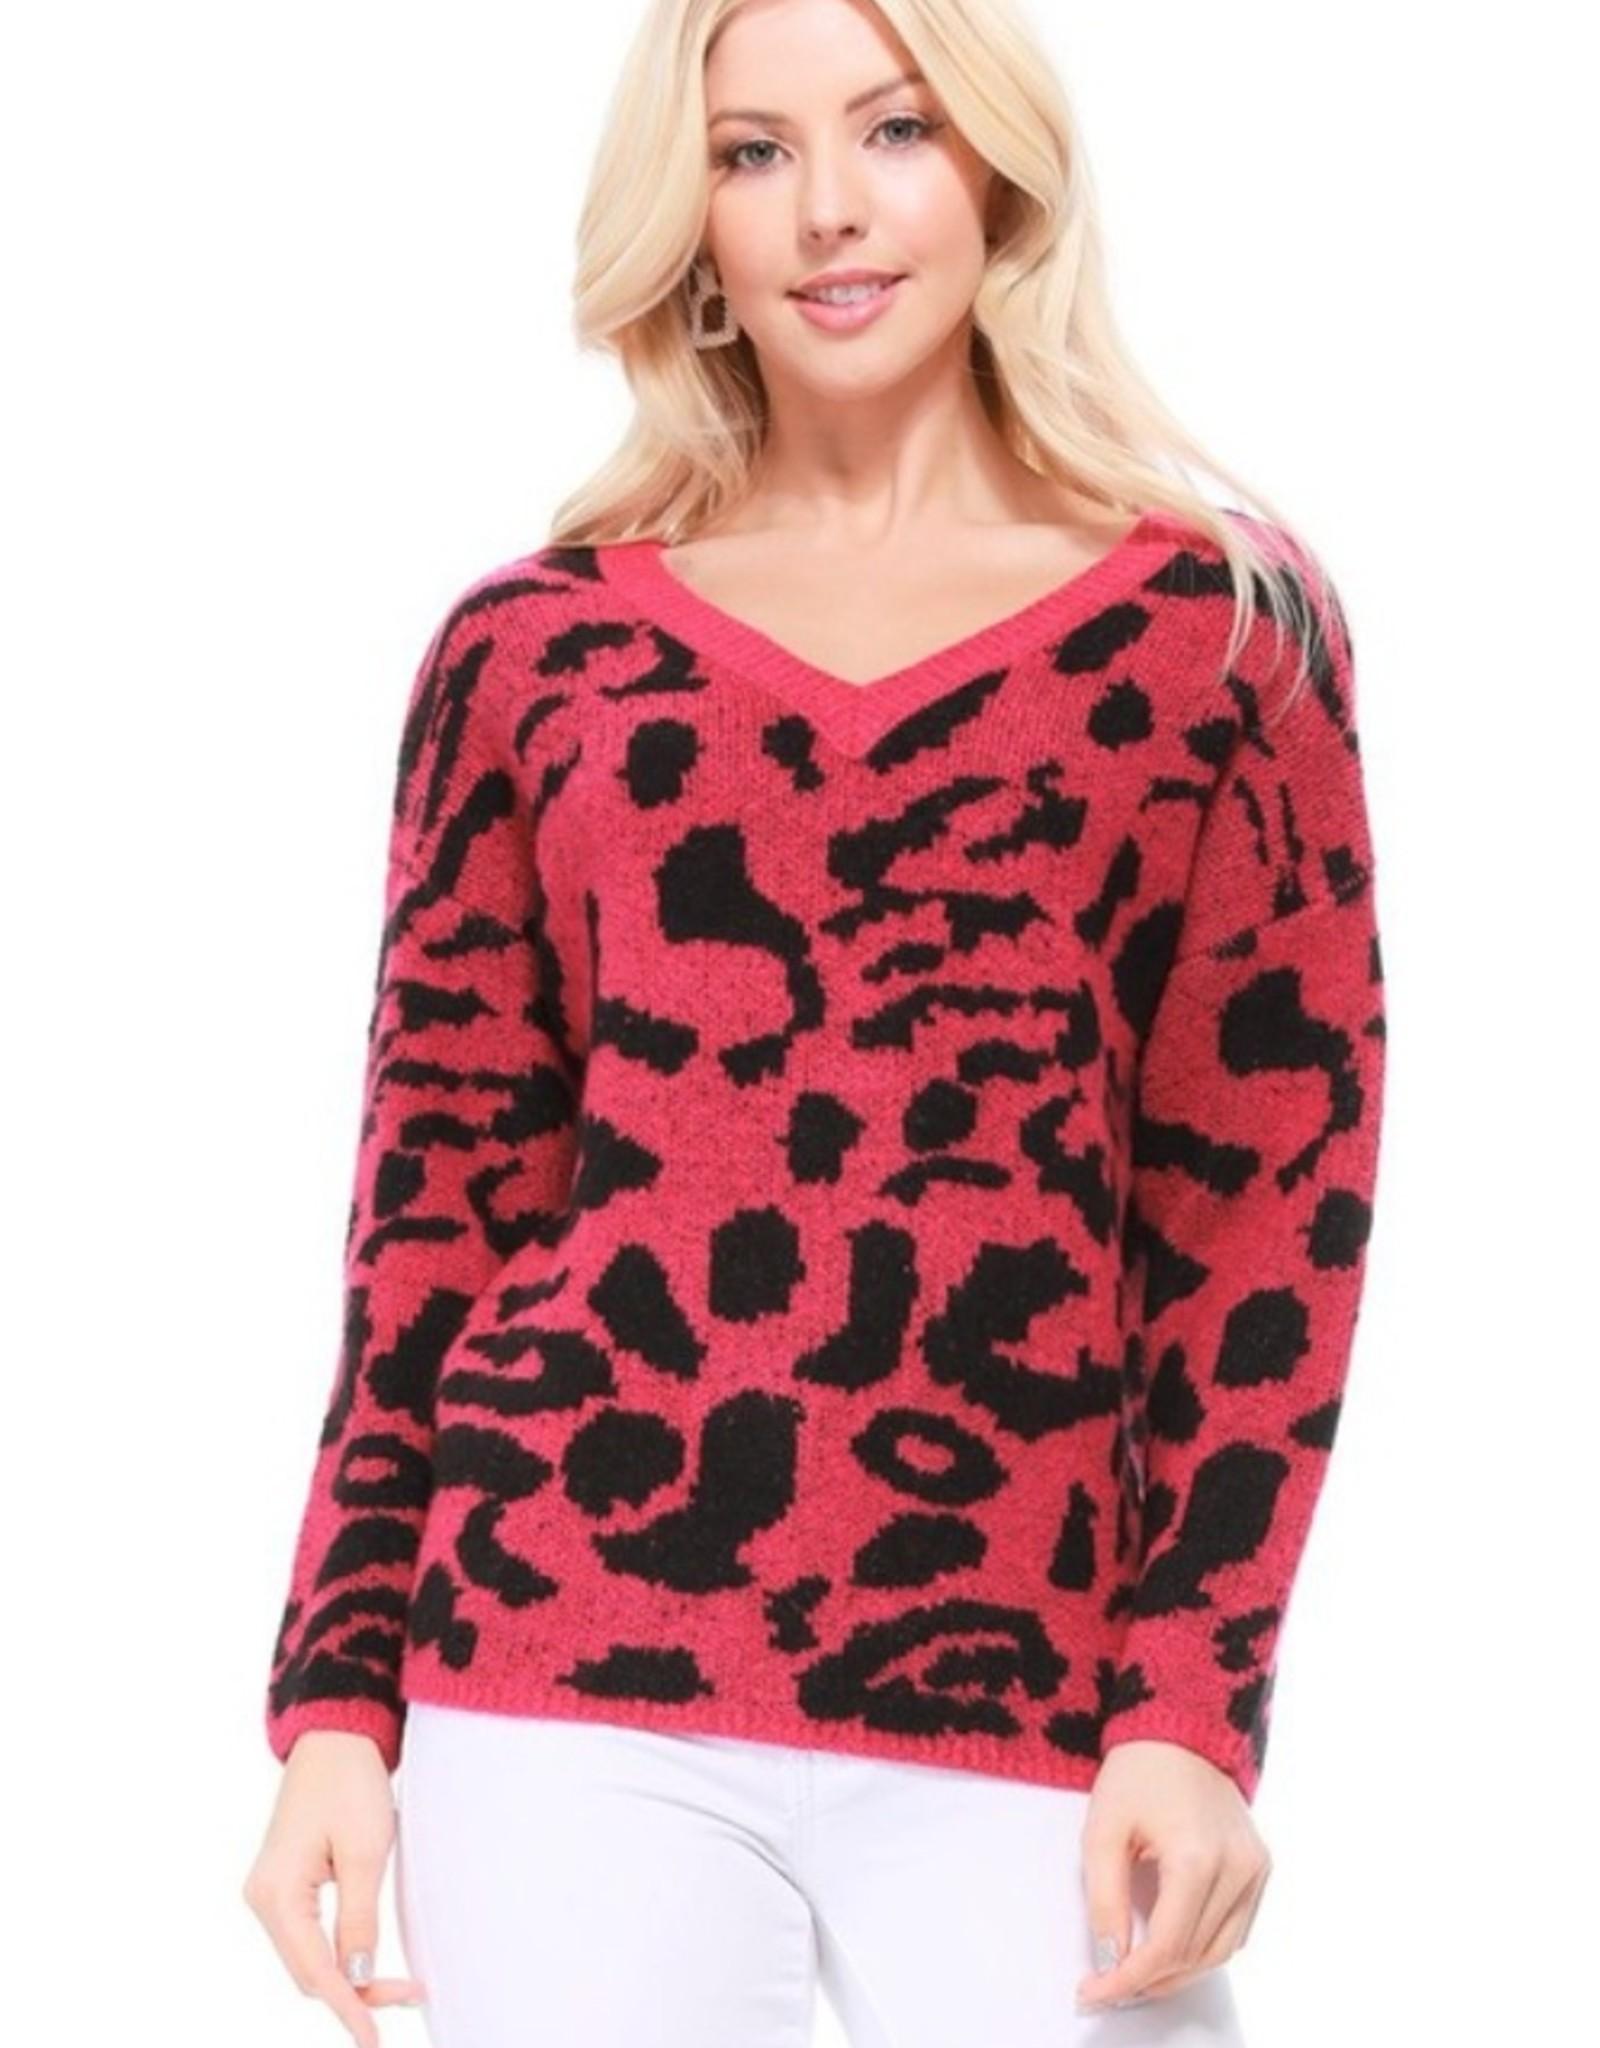 Mak animal print sweater